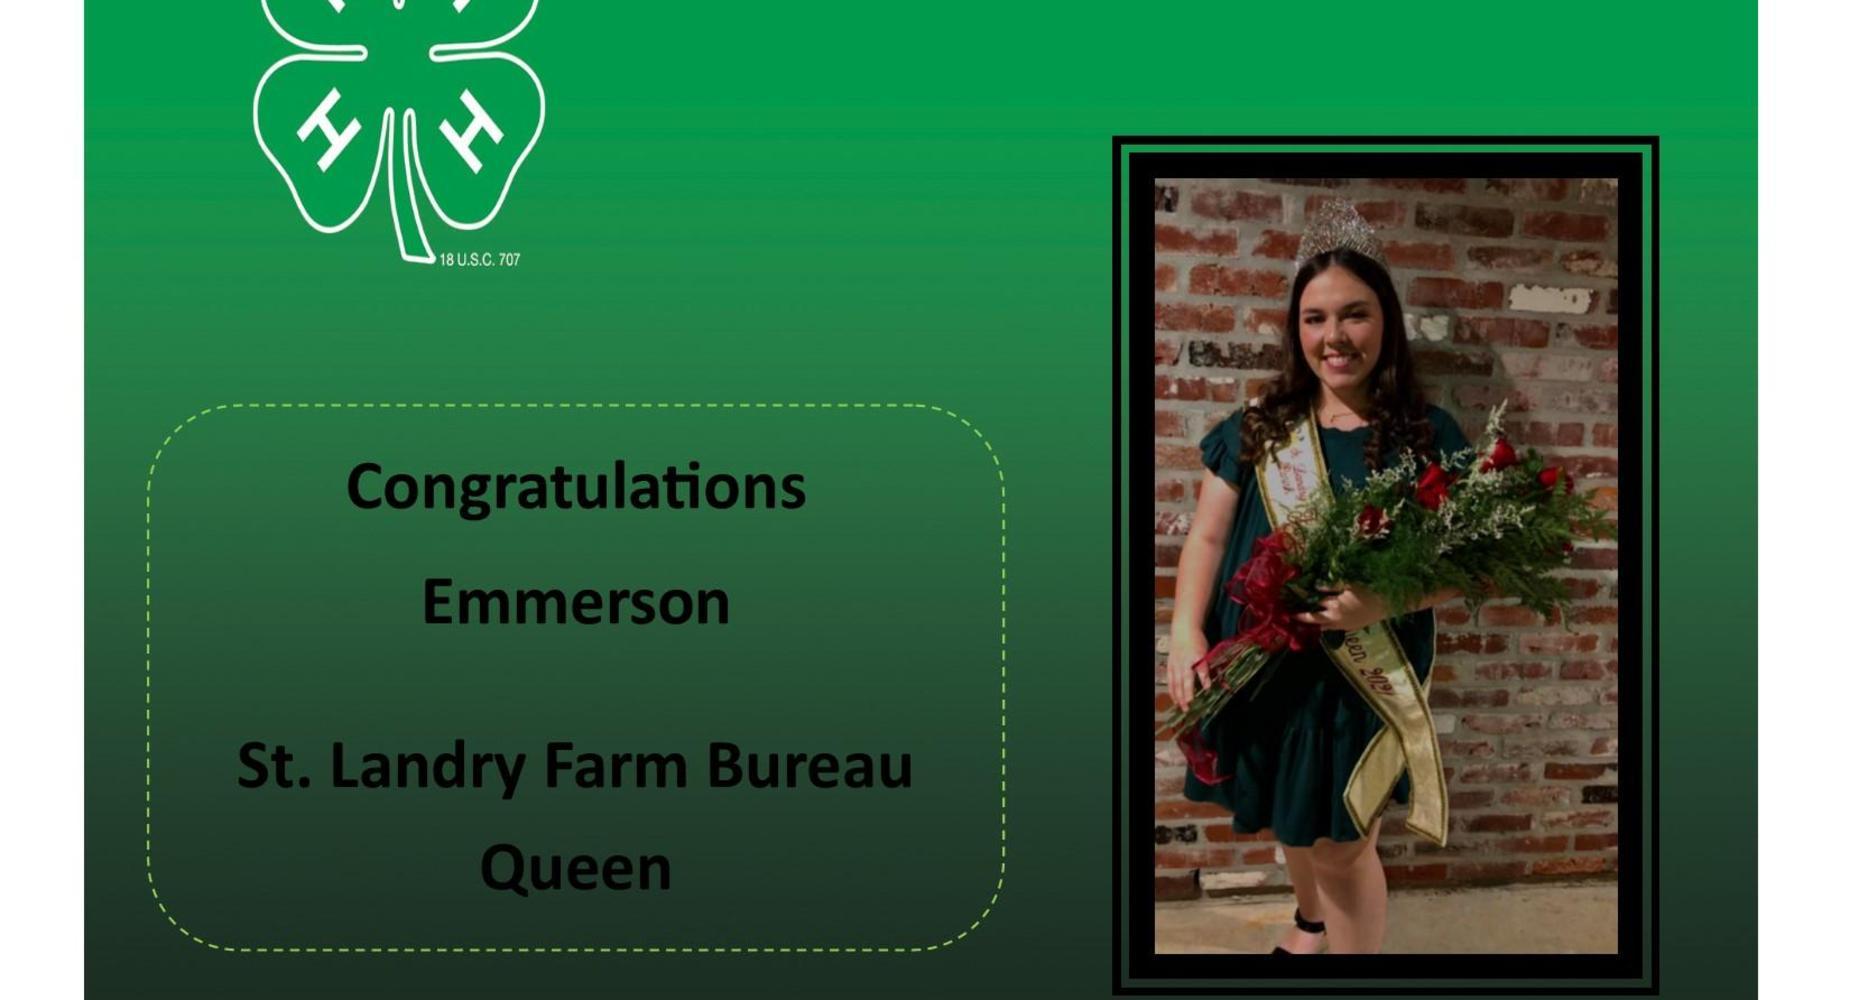 Emmerson Lyons - St. Landry Farm Bureau Queen  2020-2021